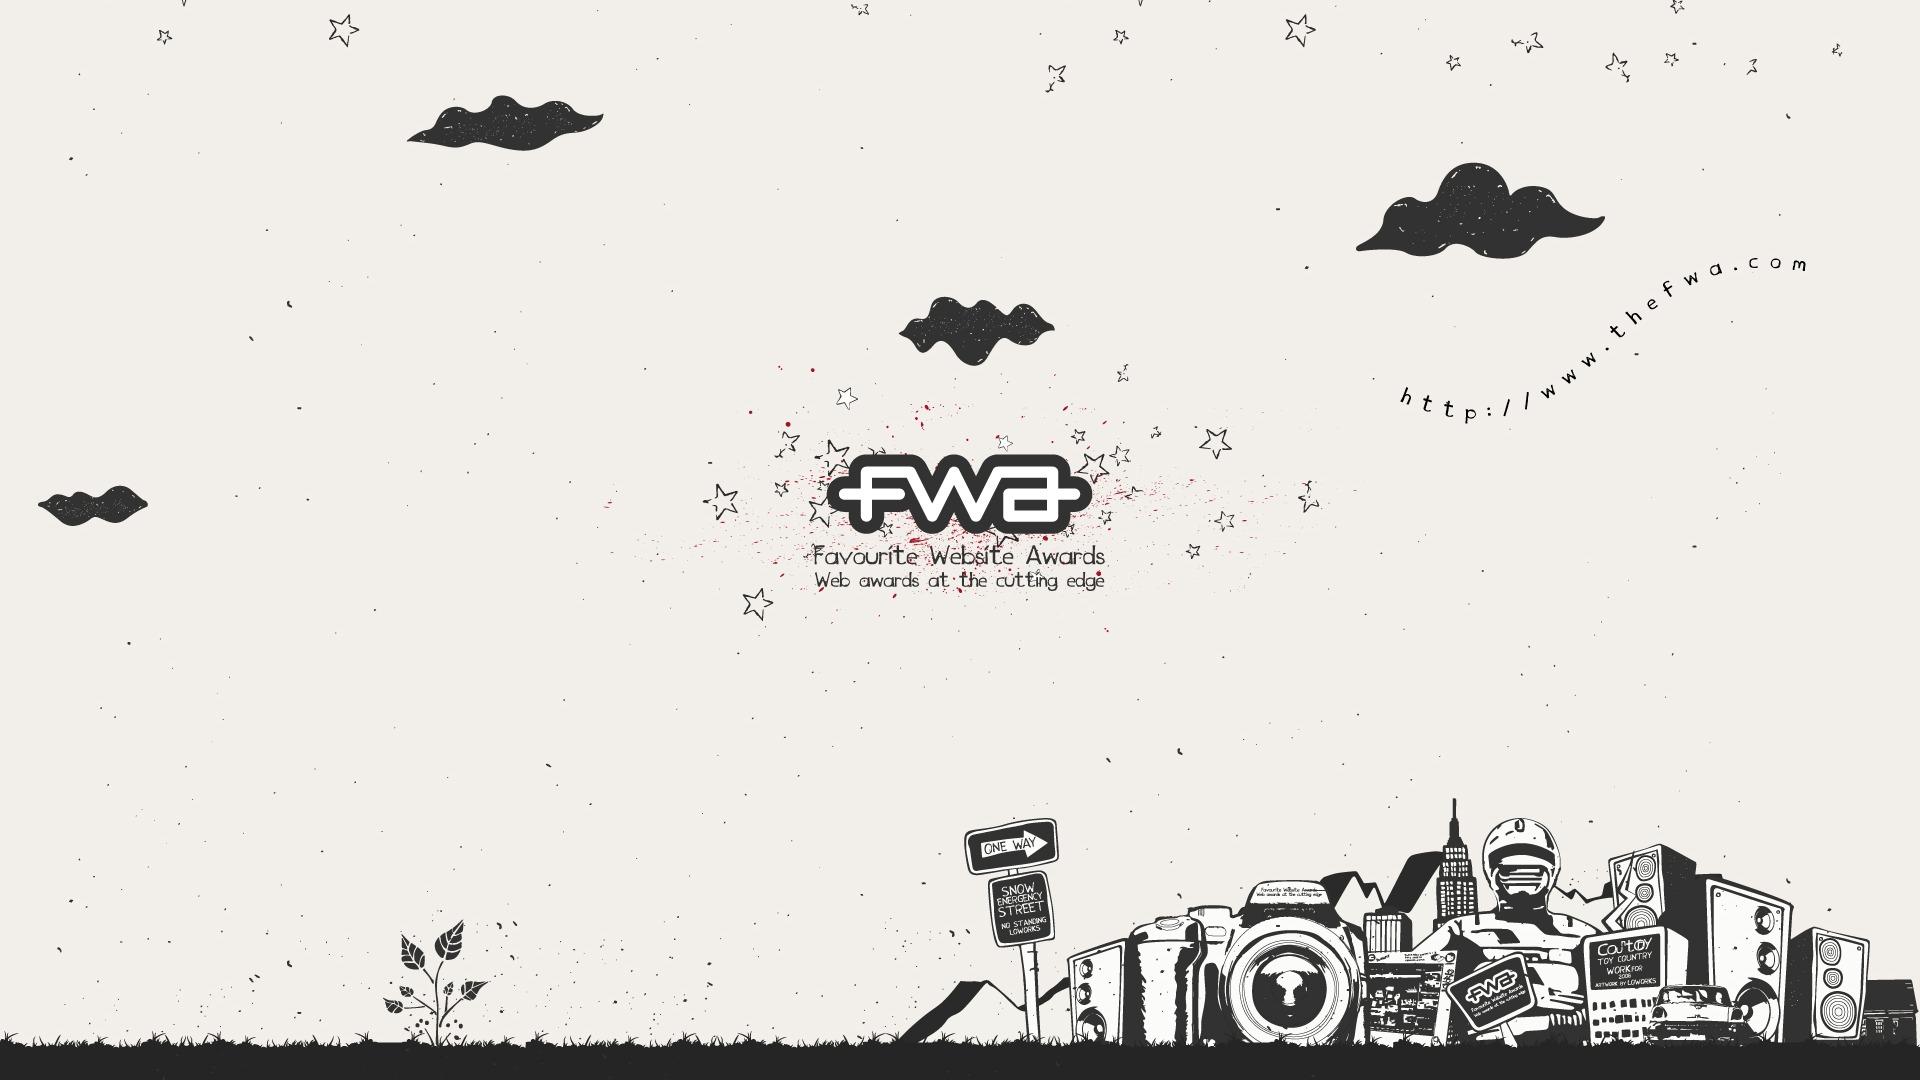 fwa_宽屏fwa专辑壁纸(六)8 - 1920x1080